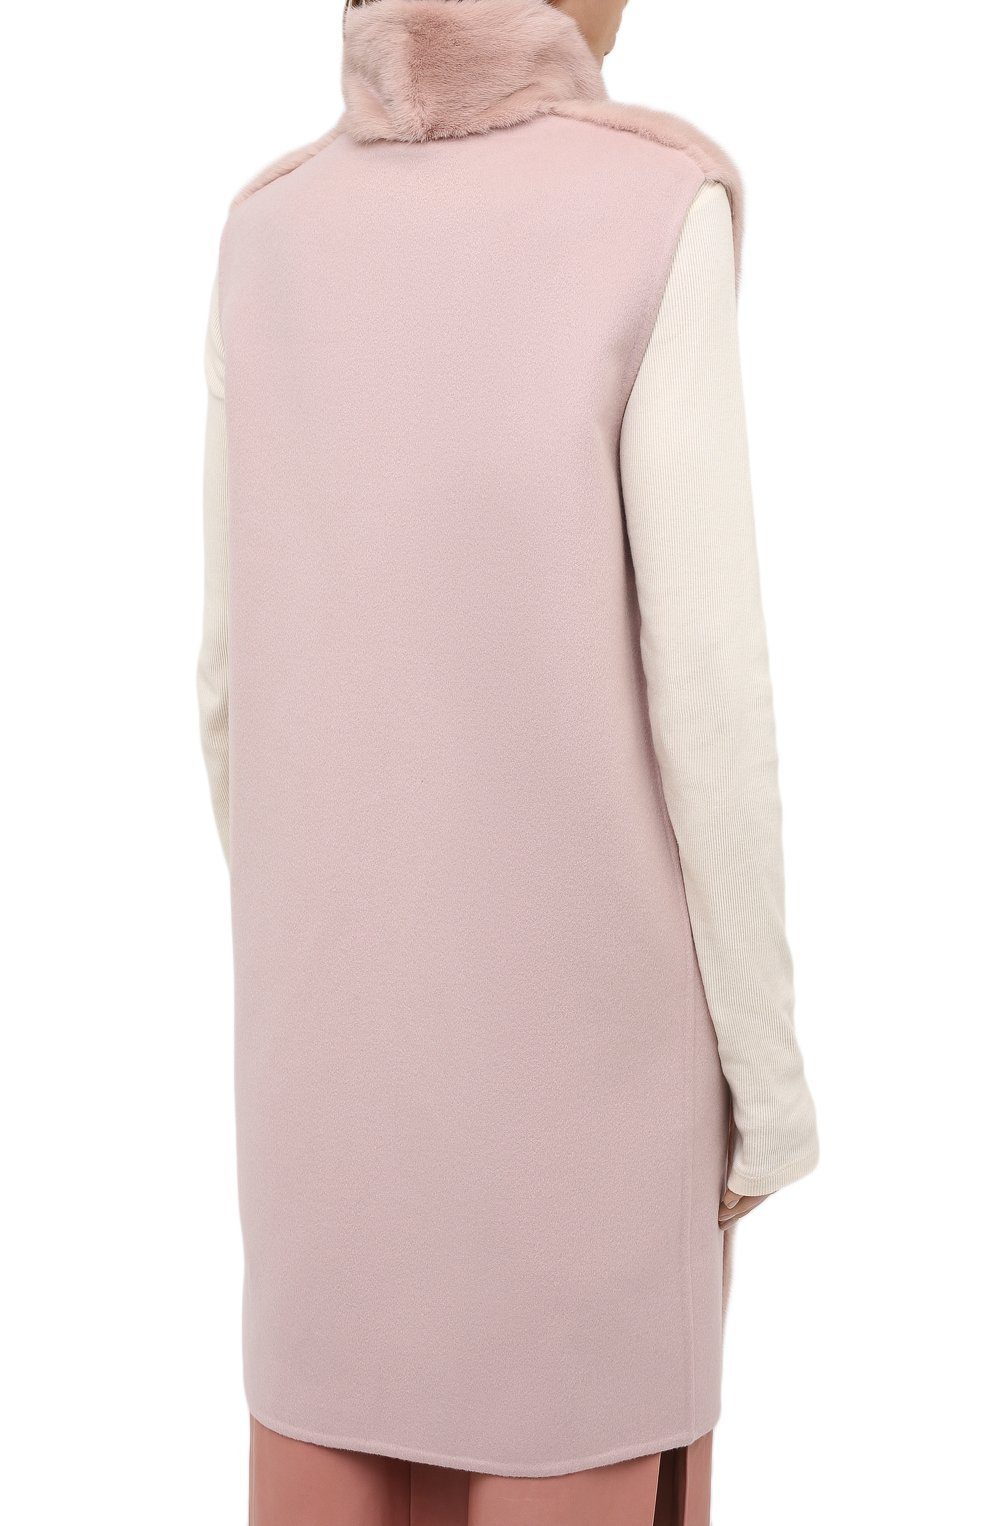 Женский жилет из меха норки MANZONI24 светло-розового цвета, арт. 20M536-VDB1/38-46   Фото 5